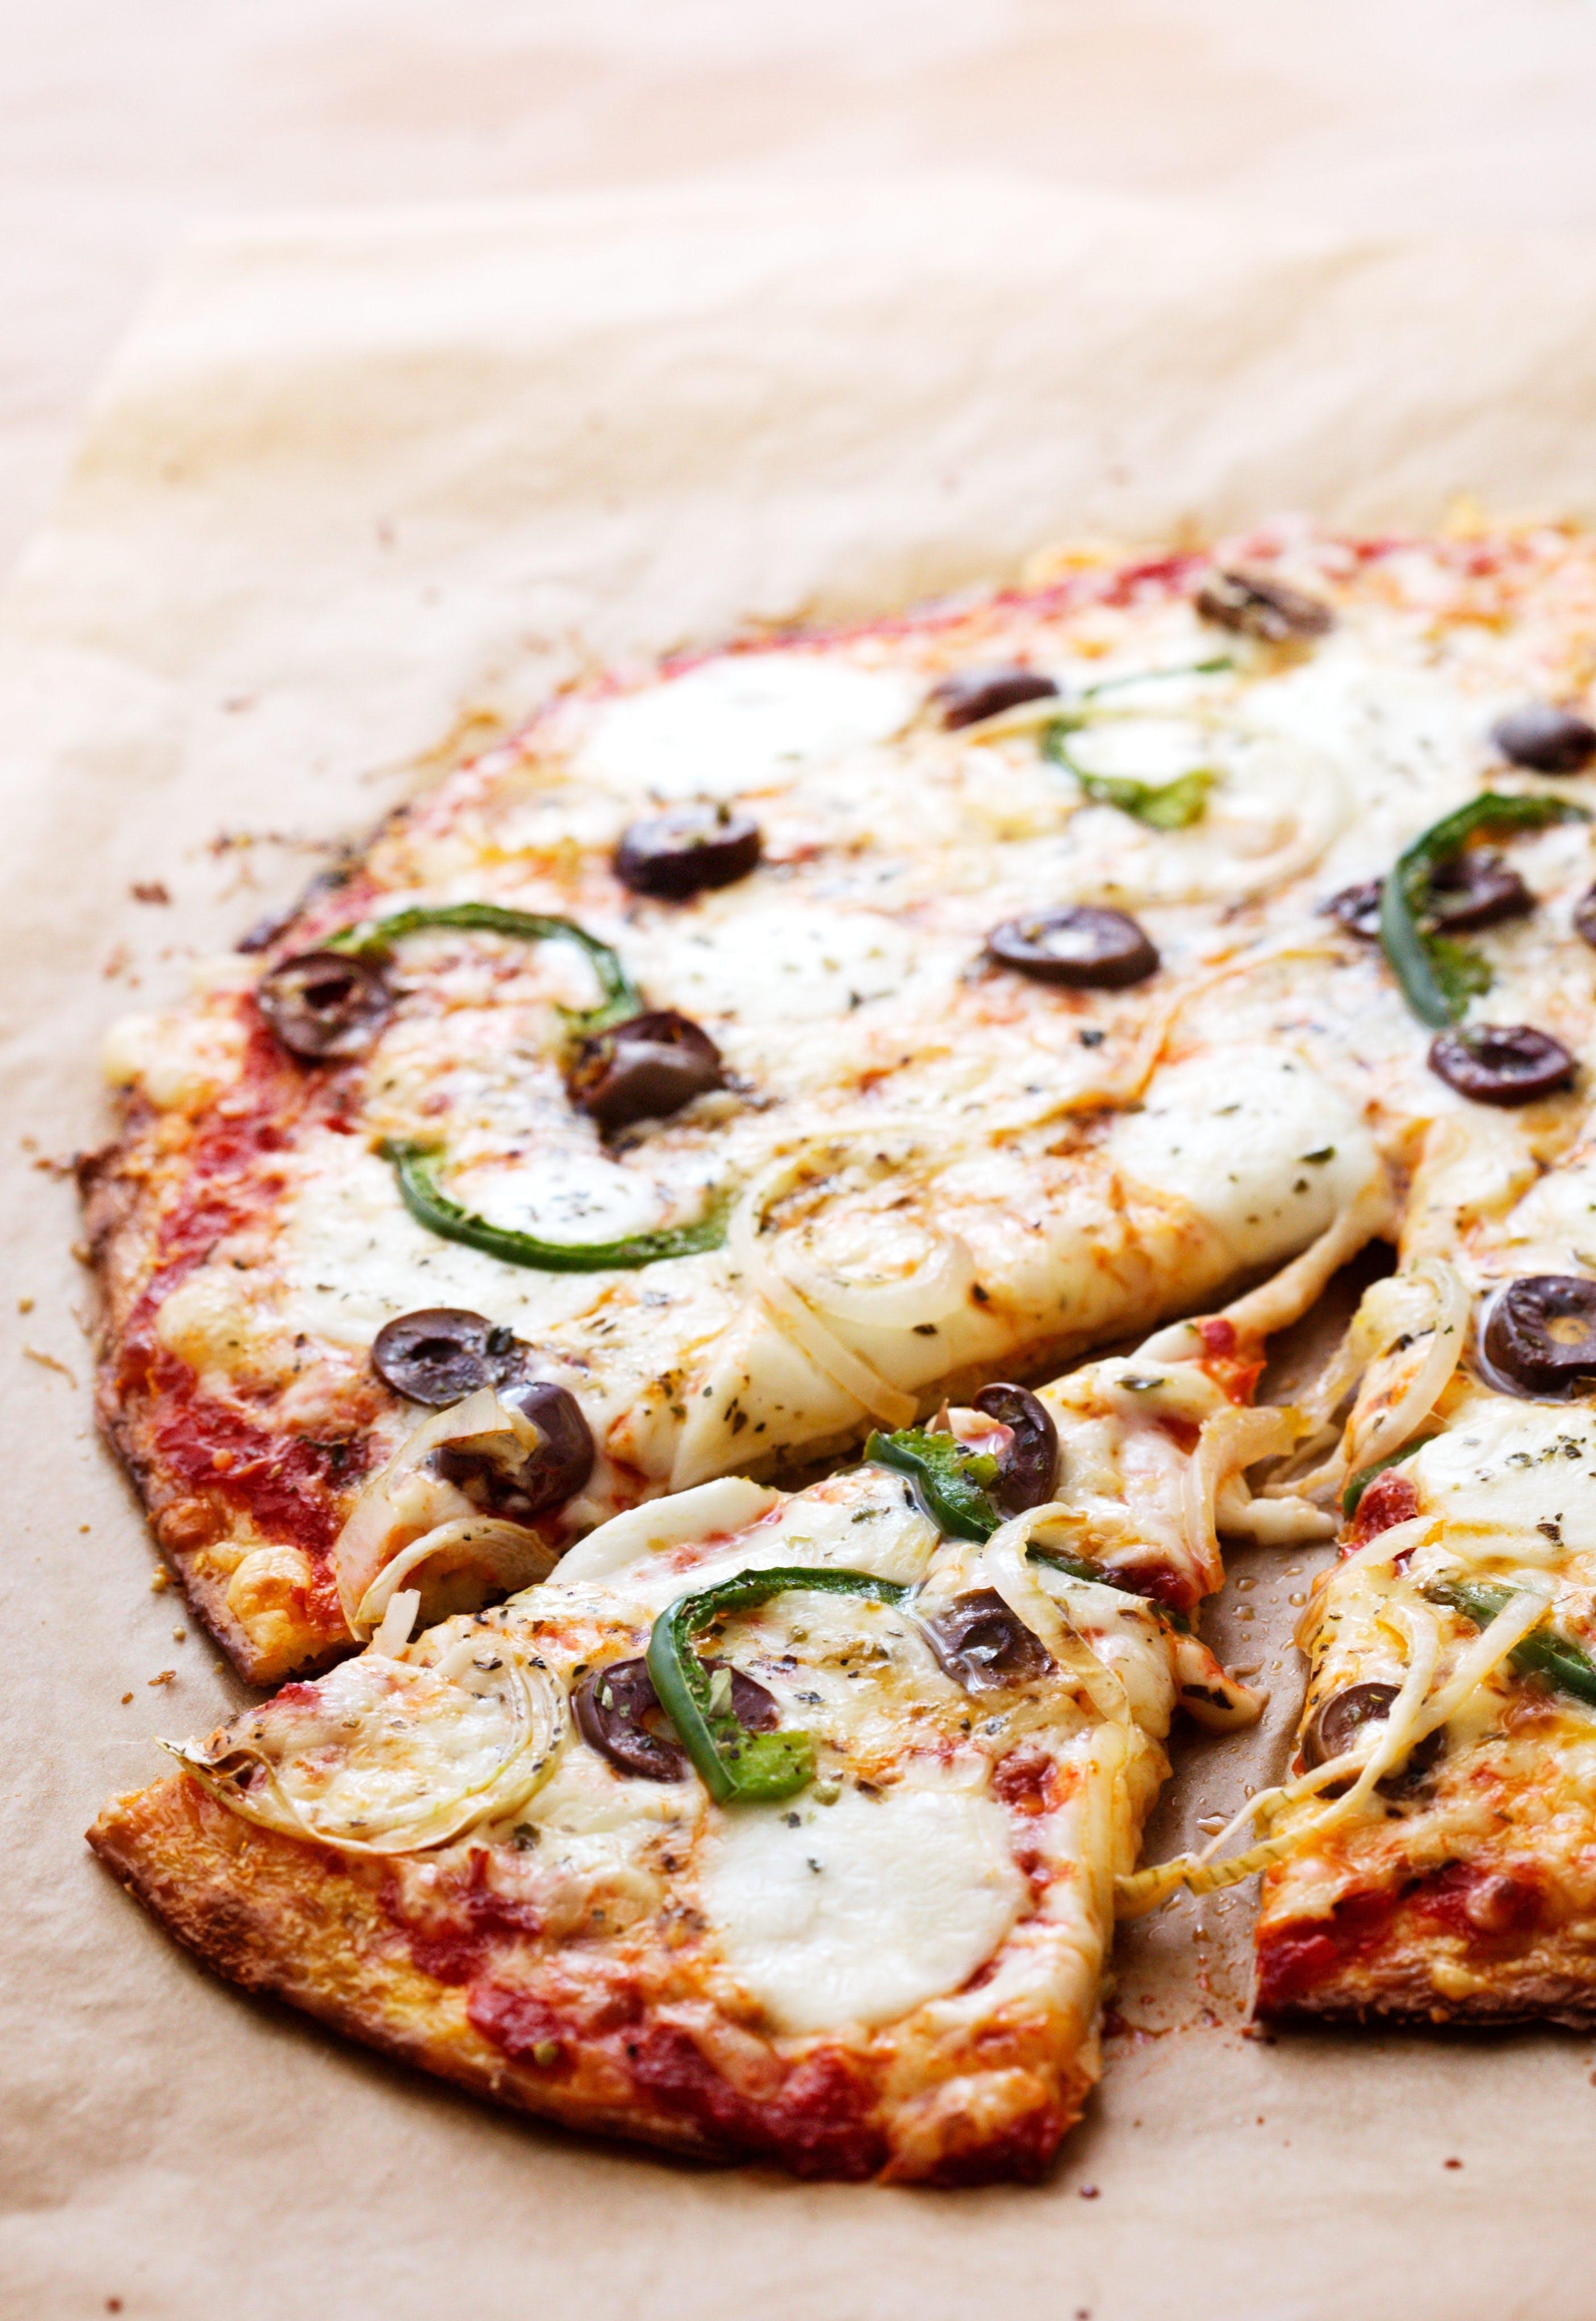 Blomkålspizza med grön paprika och oliver